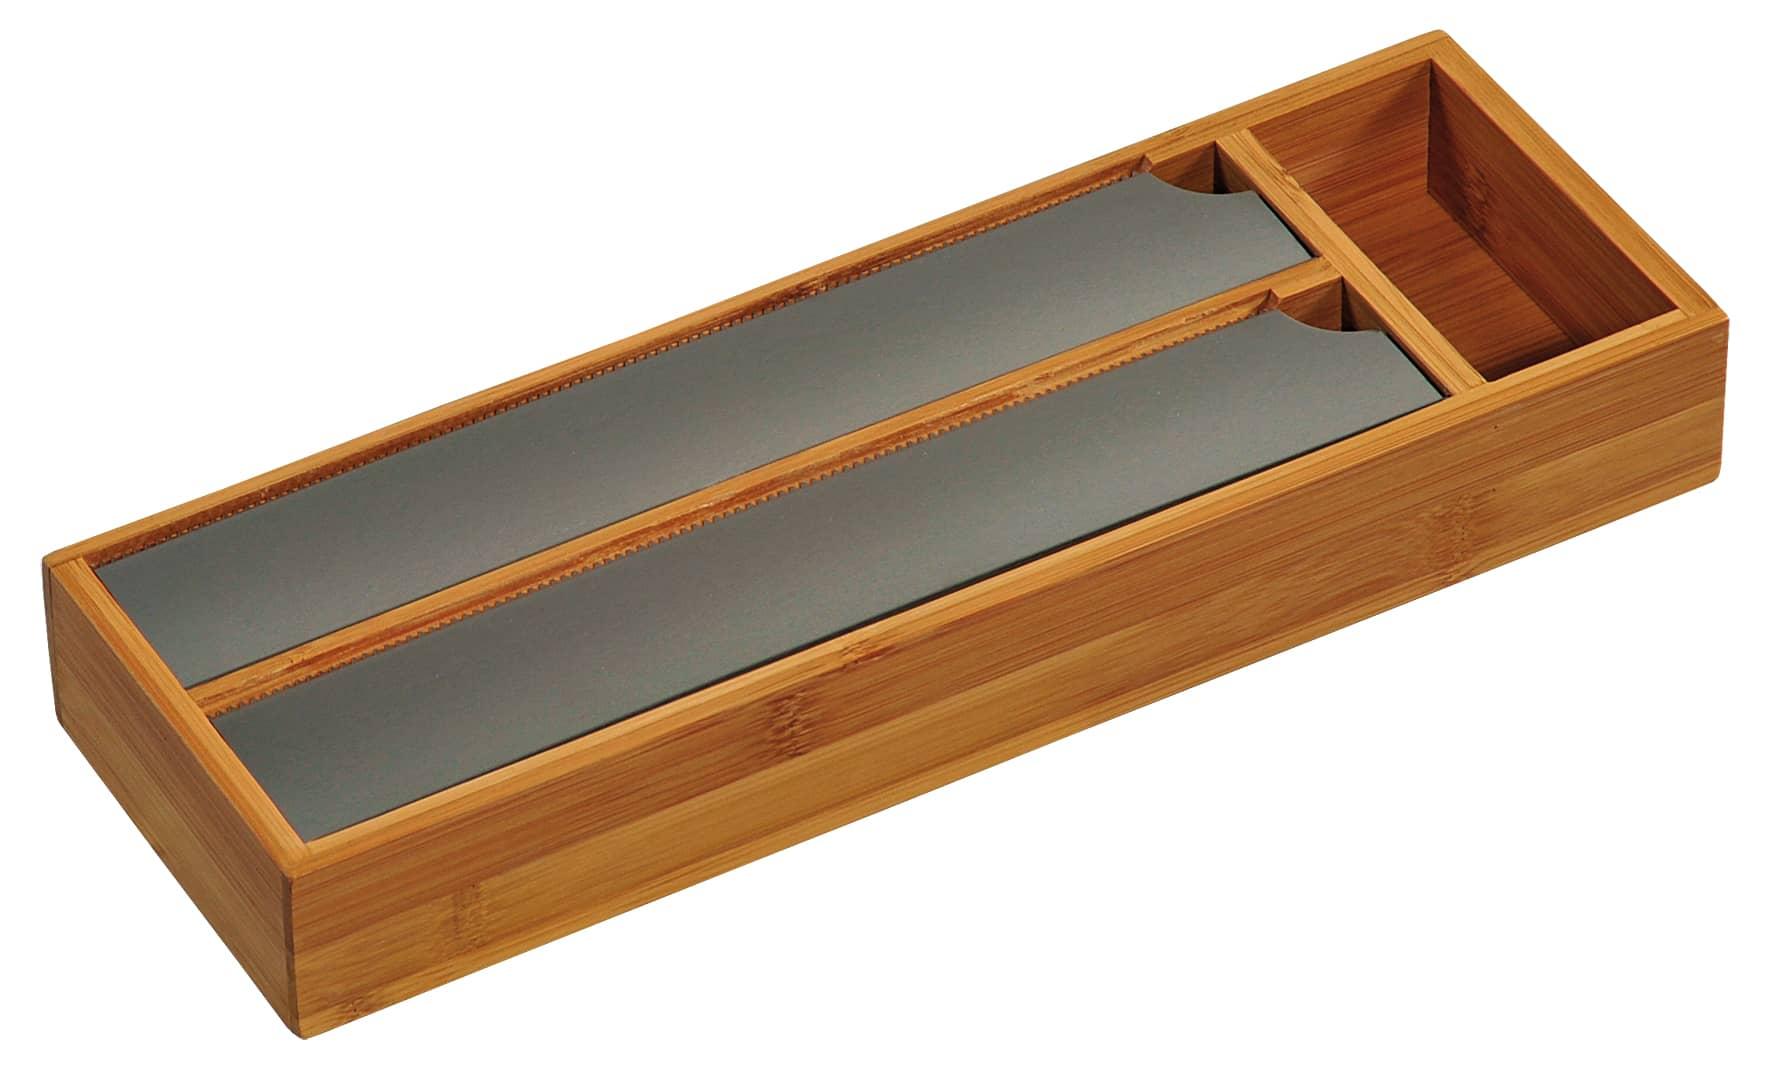 4goodz Bamboe keukenrolhouder met RVS afscheurplaten - 39,5x13x5,5 cm